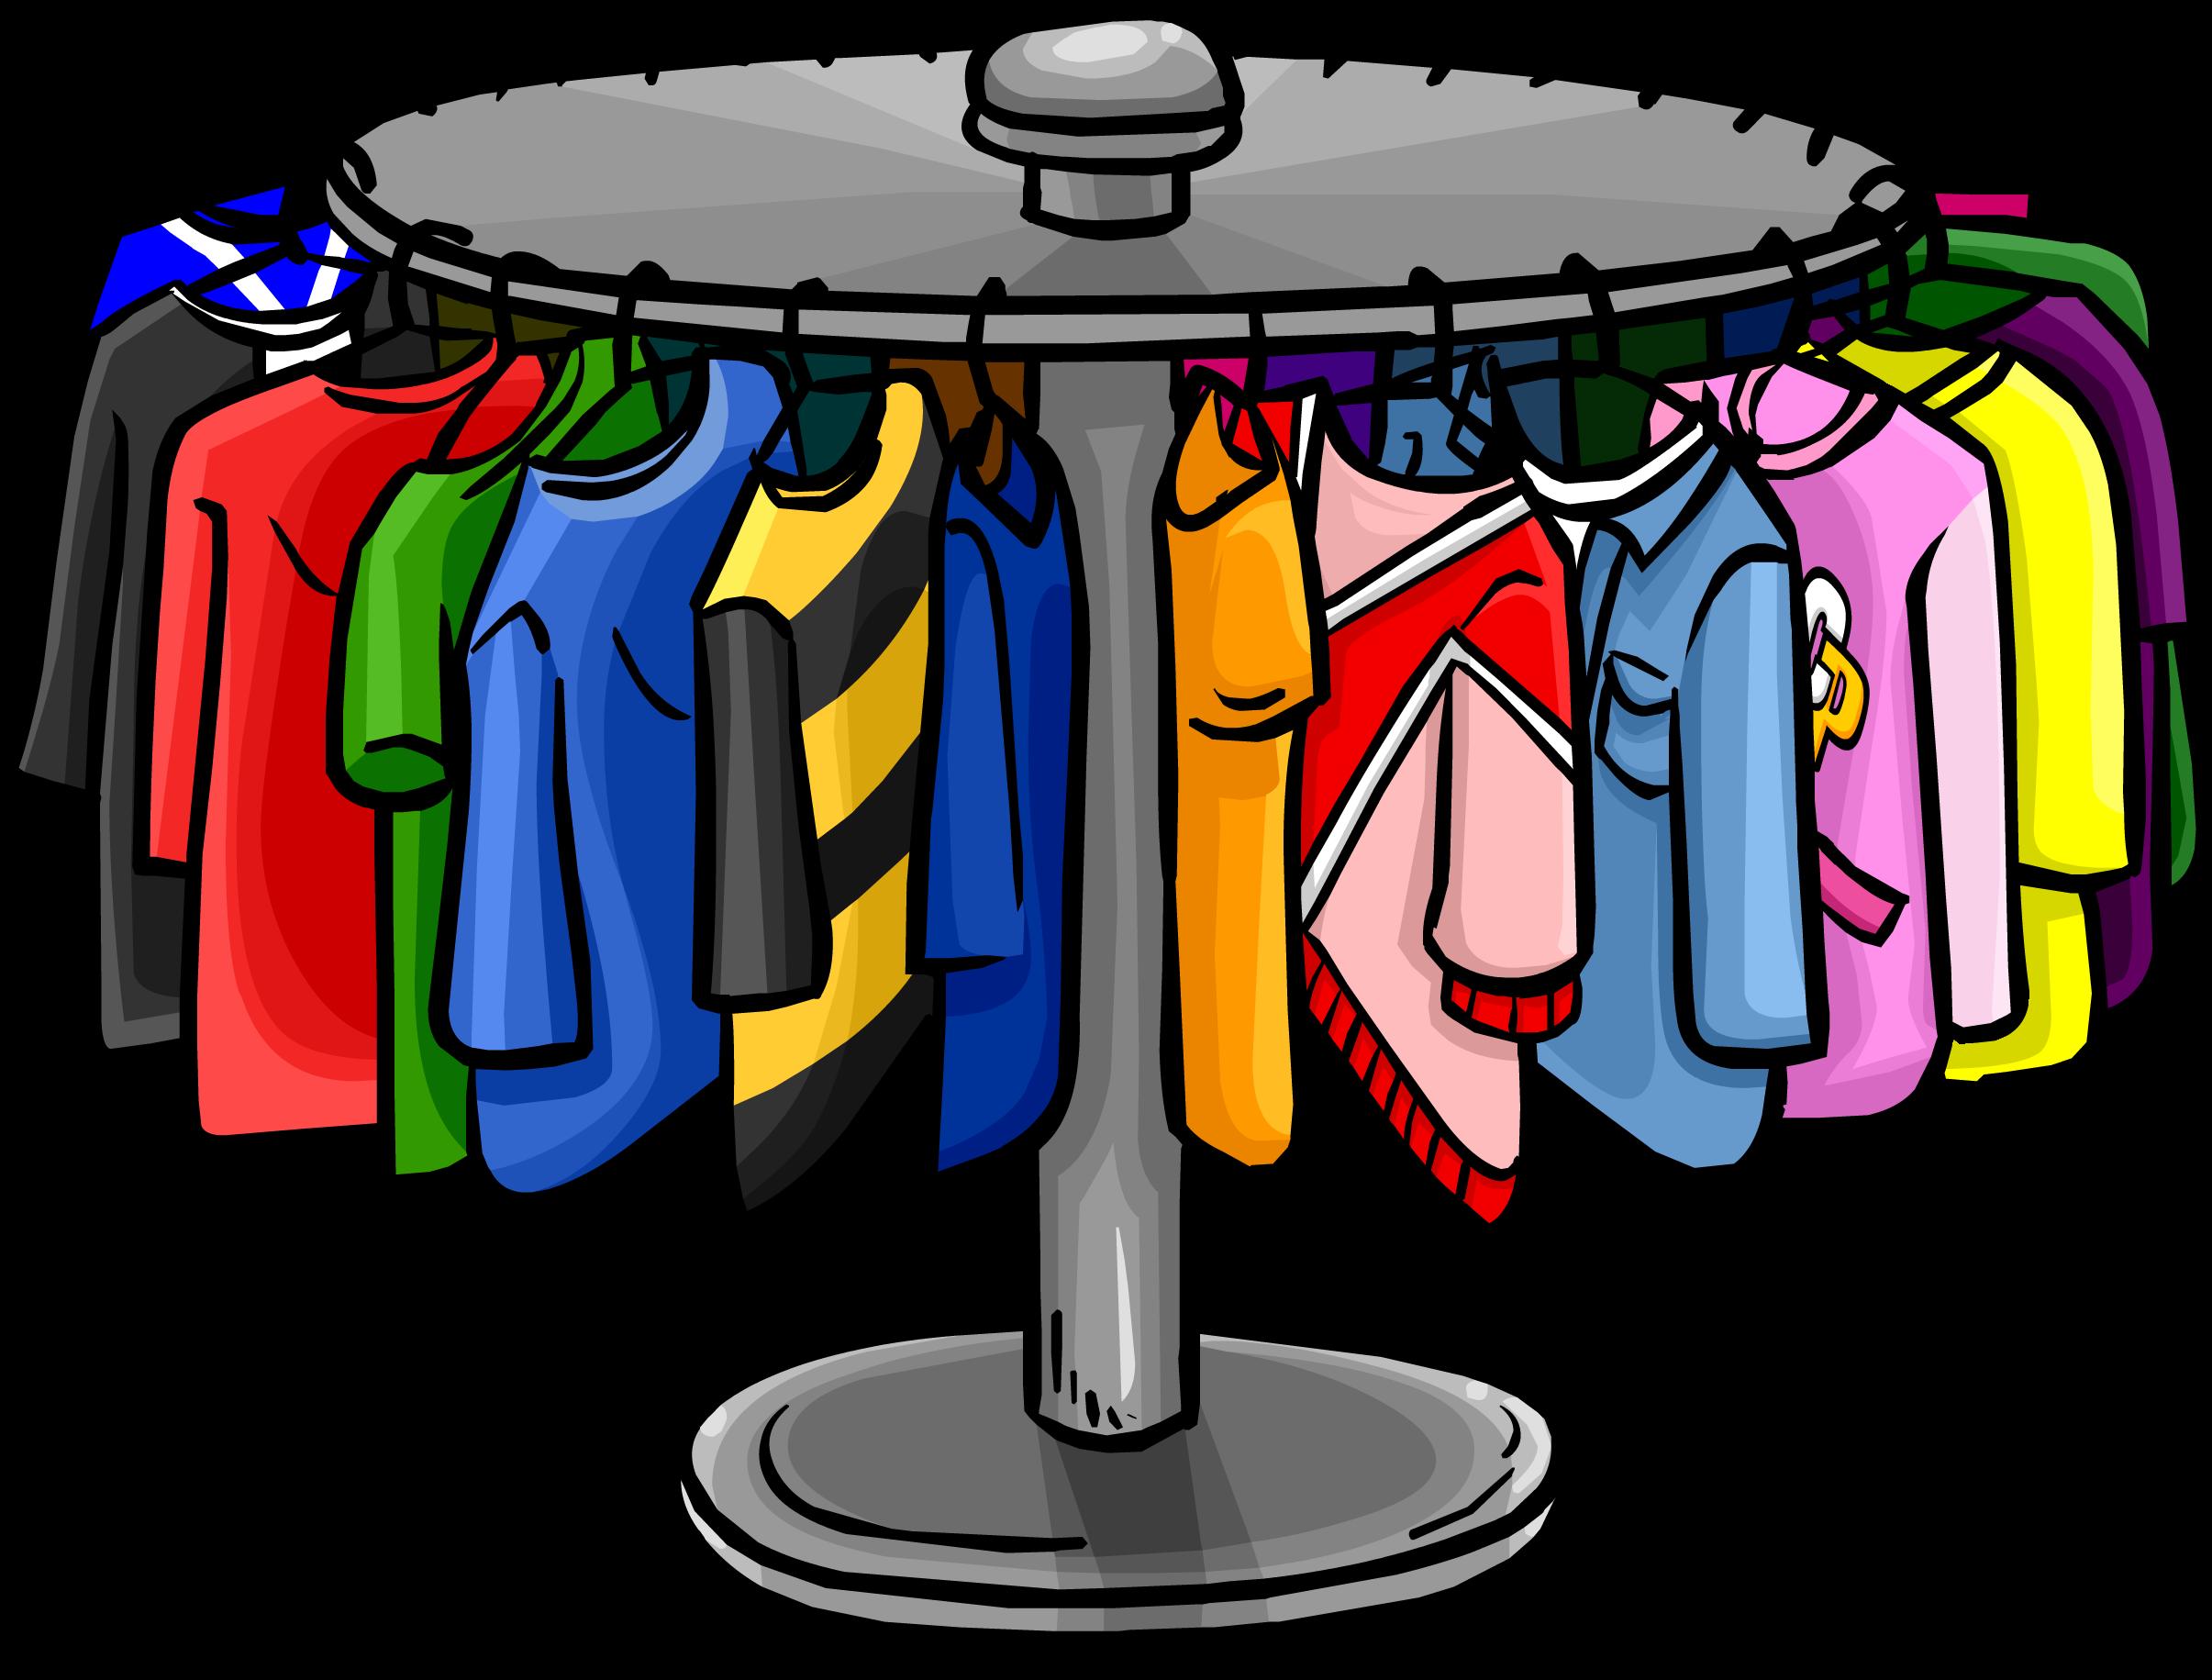 2411x1831 Clothing Clothes Clip Art Free Clipart Images 3 Clipartix